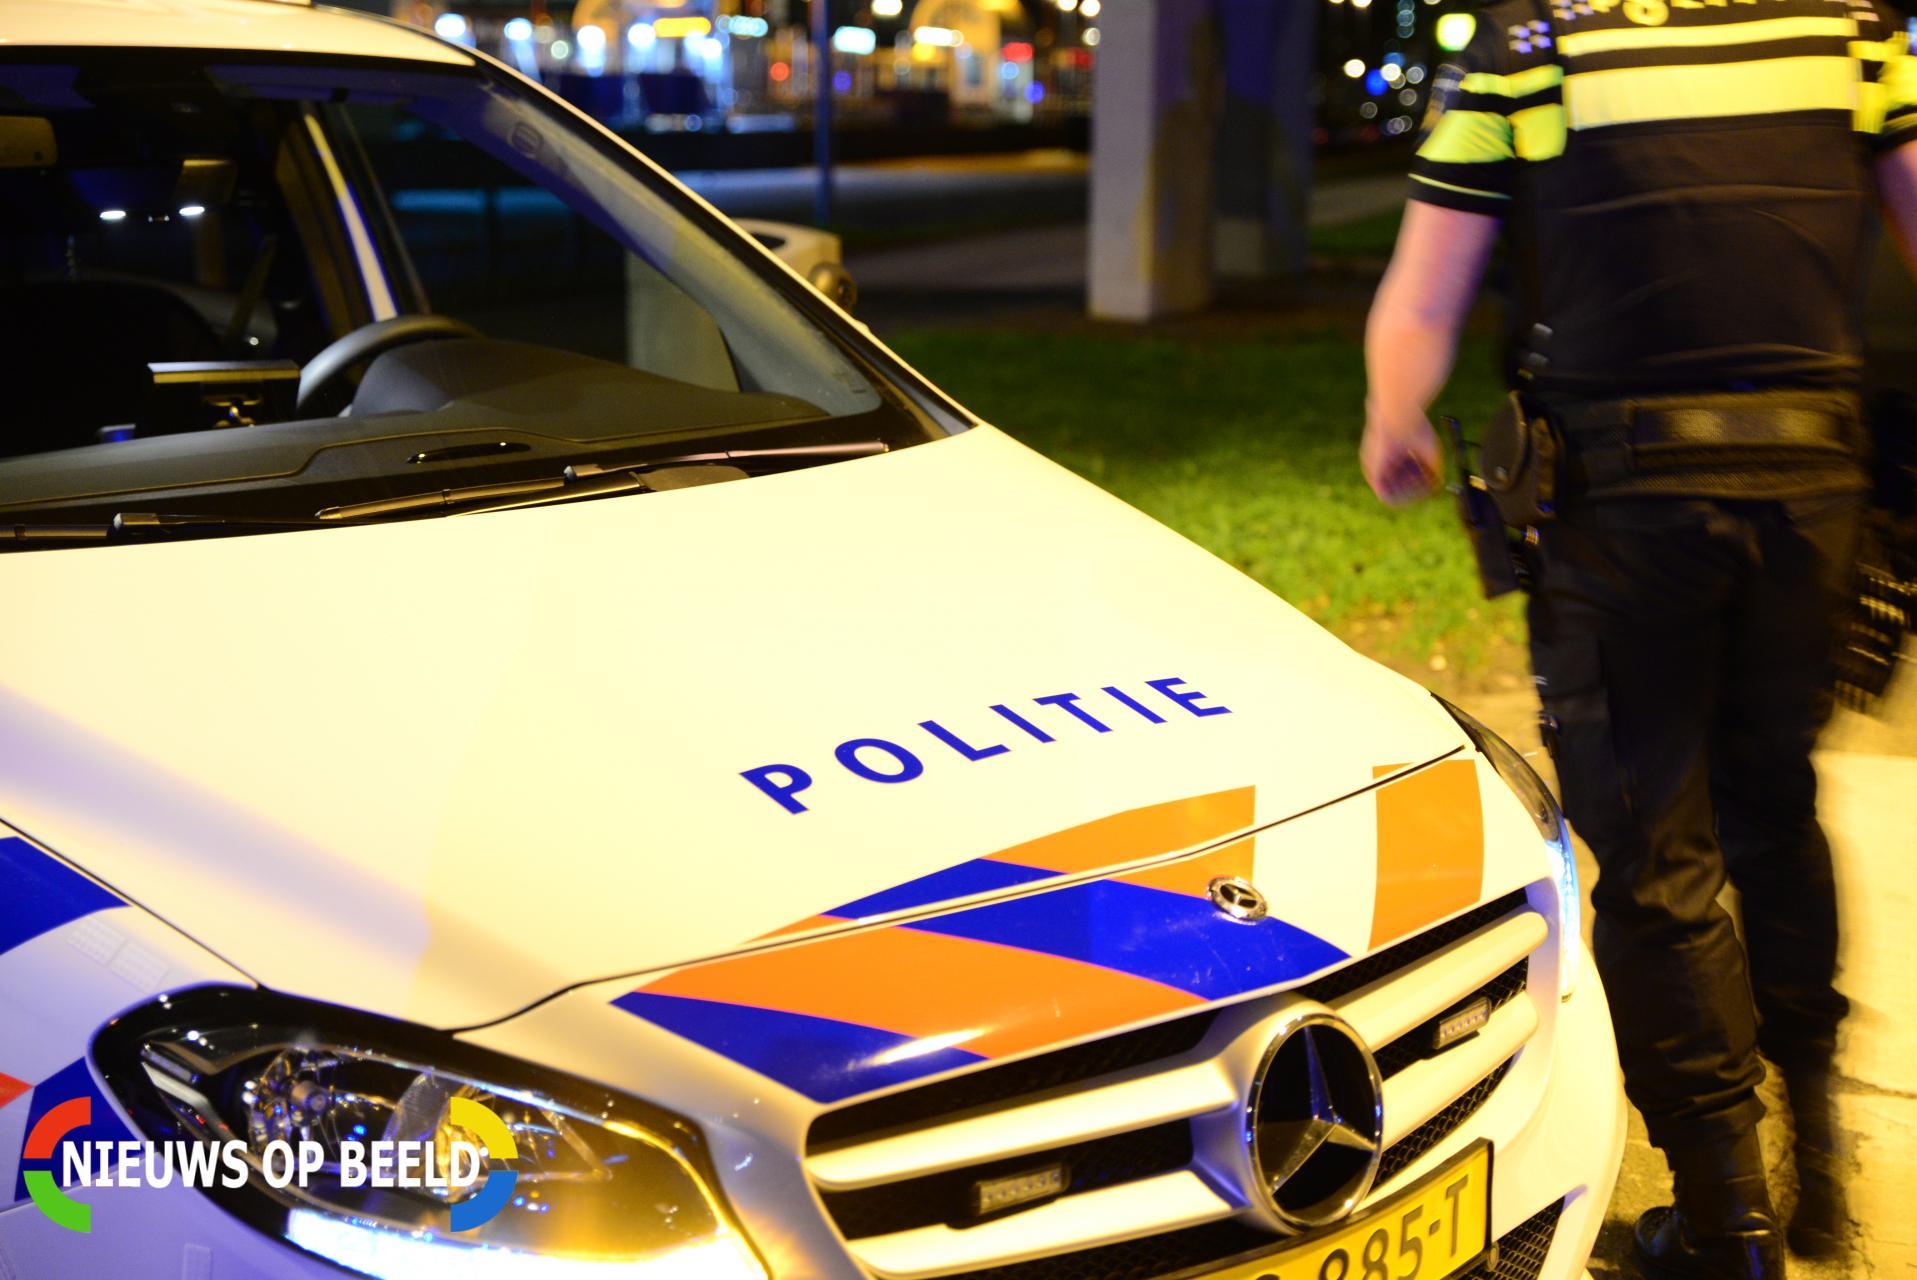 Jongen raakt gewond in speeltuin Pascalweg Rotterdam